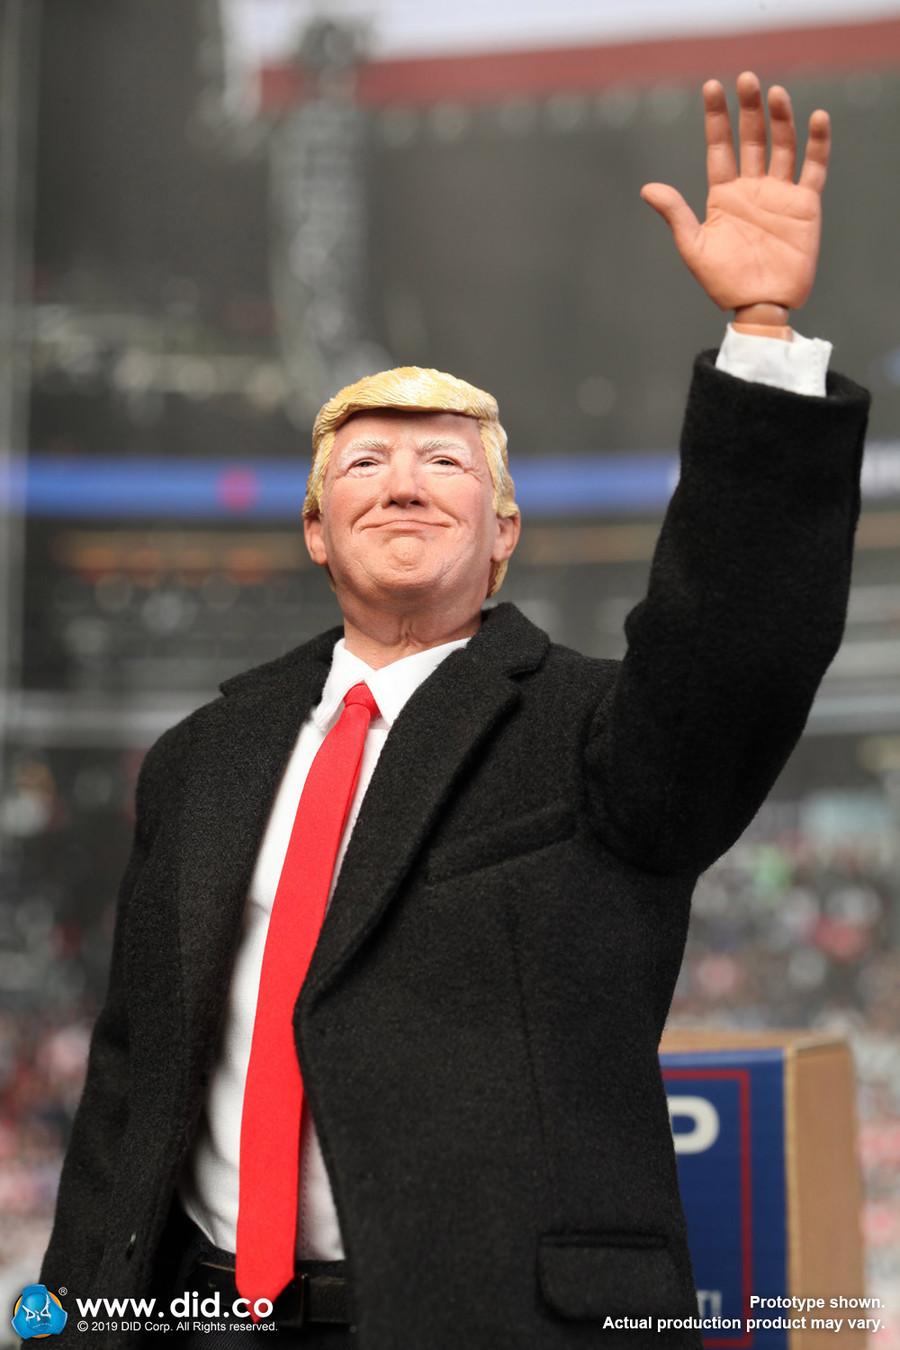 DID - Donald Trump 2020